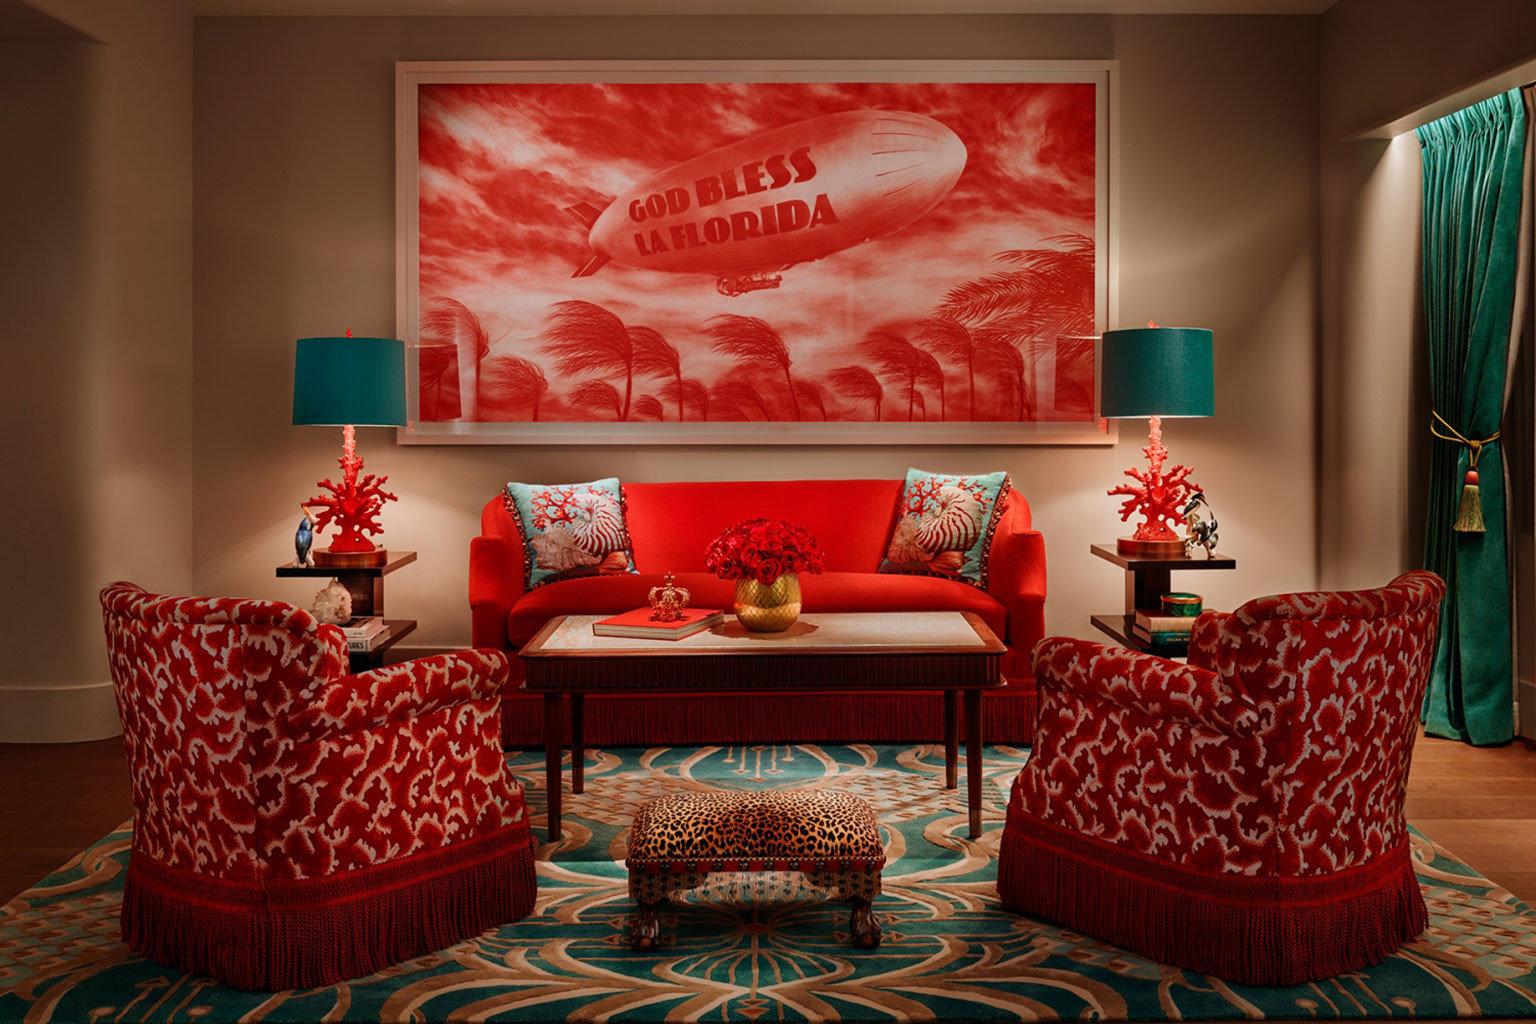 Hotels wall indoor room red living room Living interior design modern art home Design Suite area decorated furniture